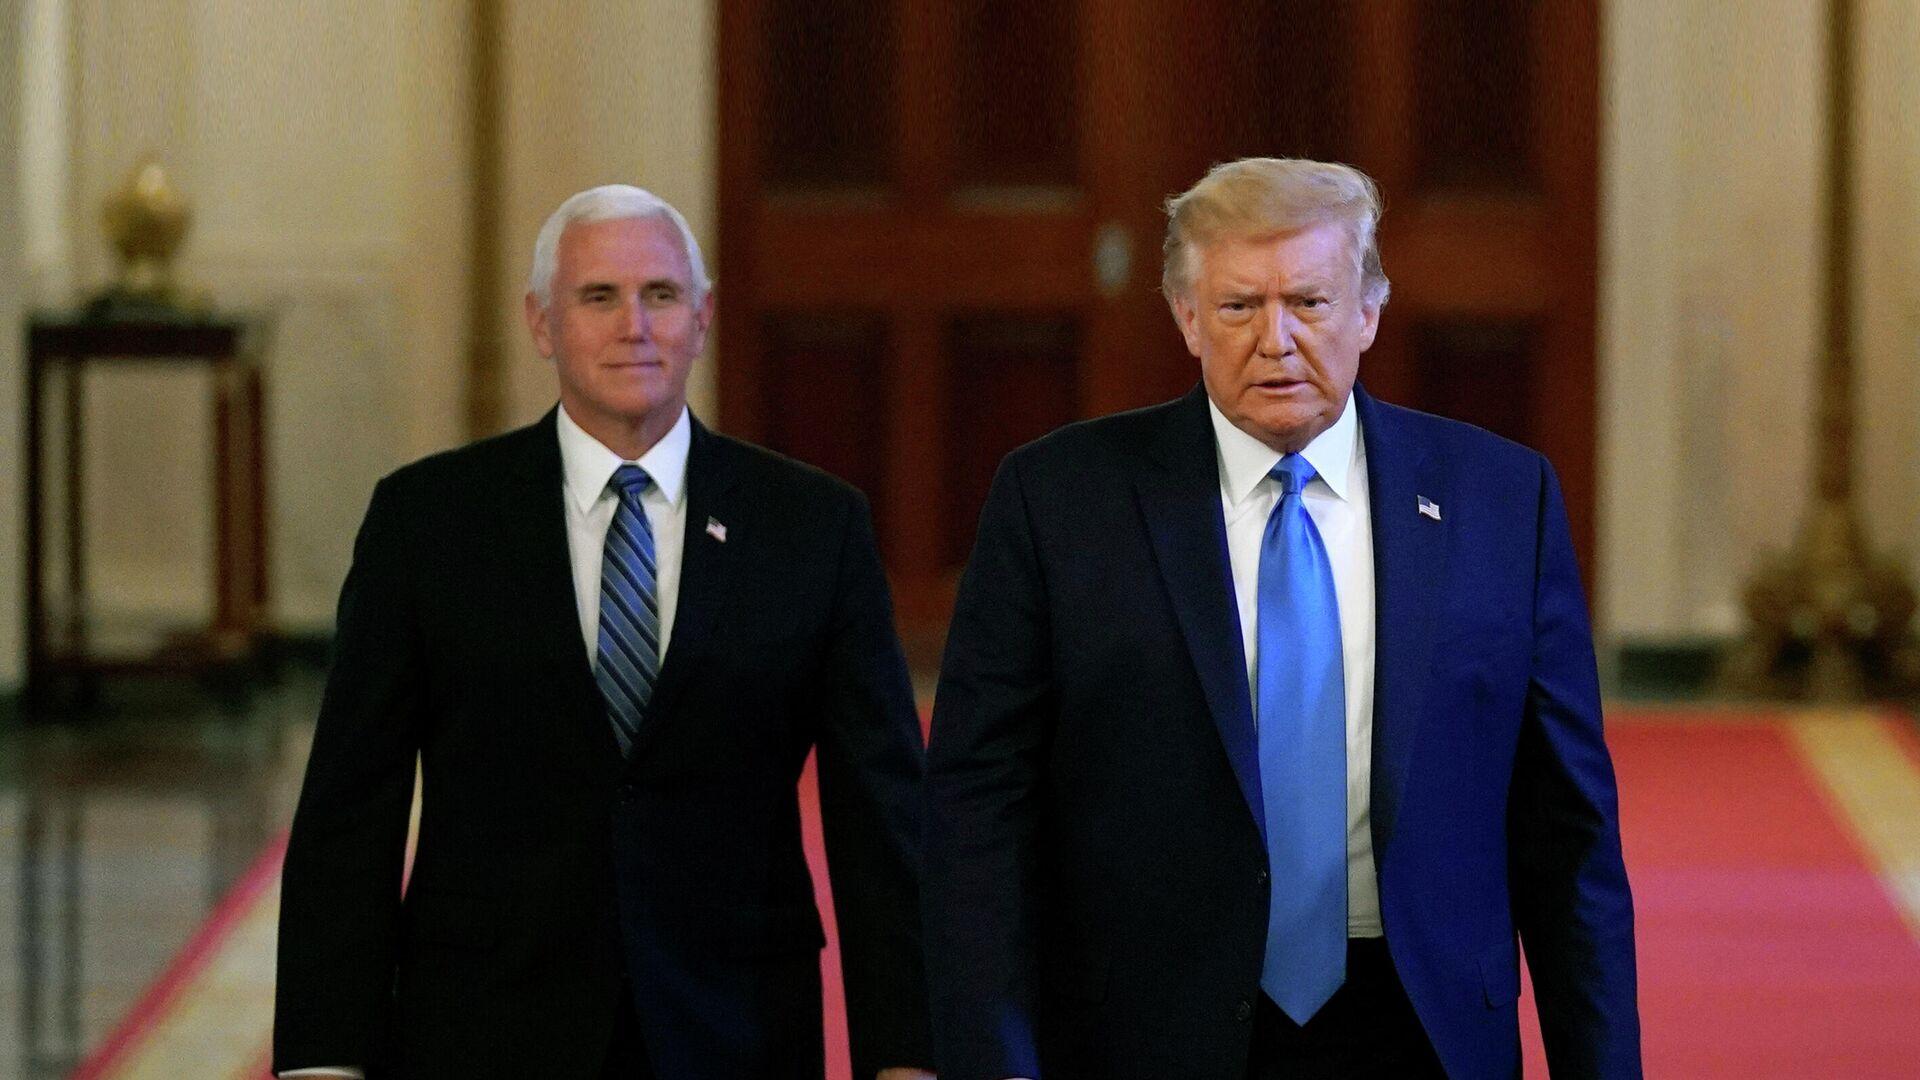 Президент США Дональд Трамп и вице-президент Майк Пенс - РИА Новости, 1920, 21.02.2021